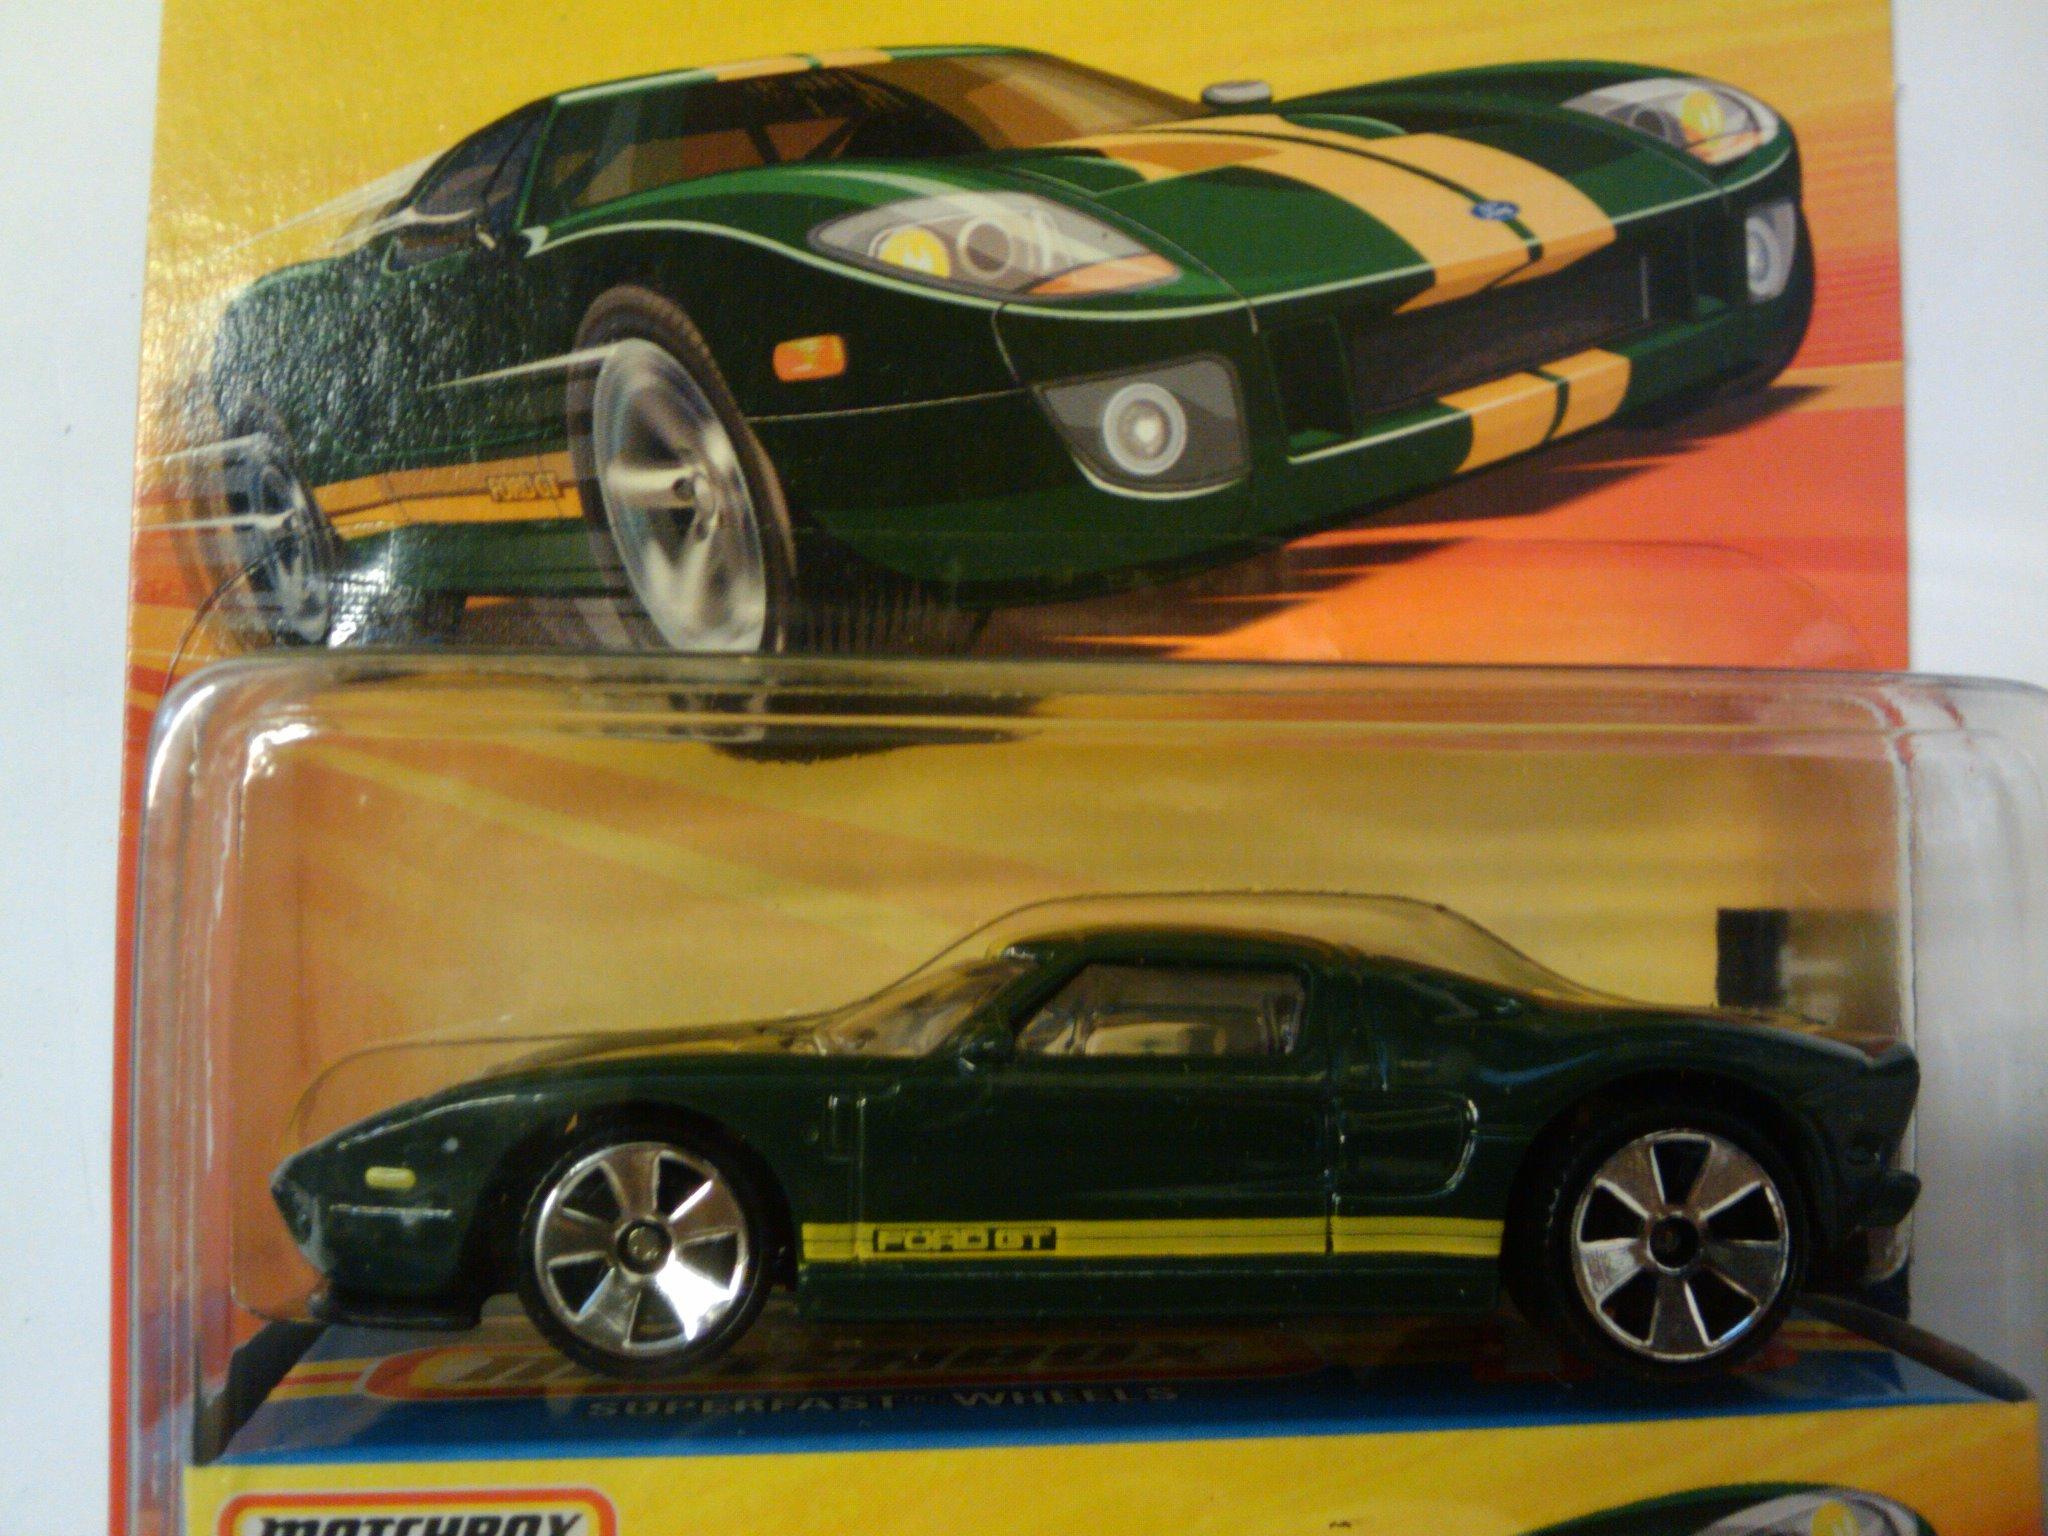 Superfast Ford Gt Green Jpg